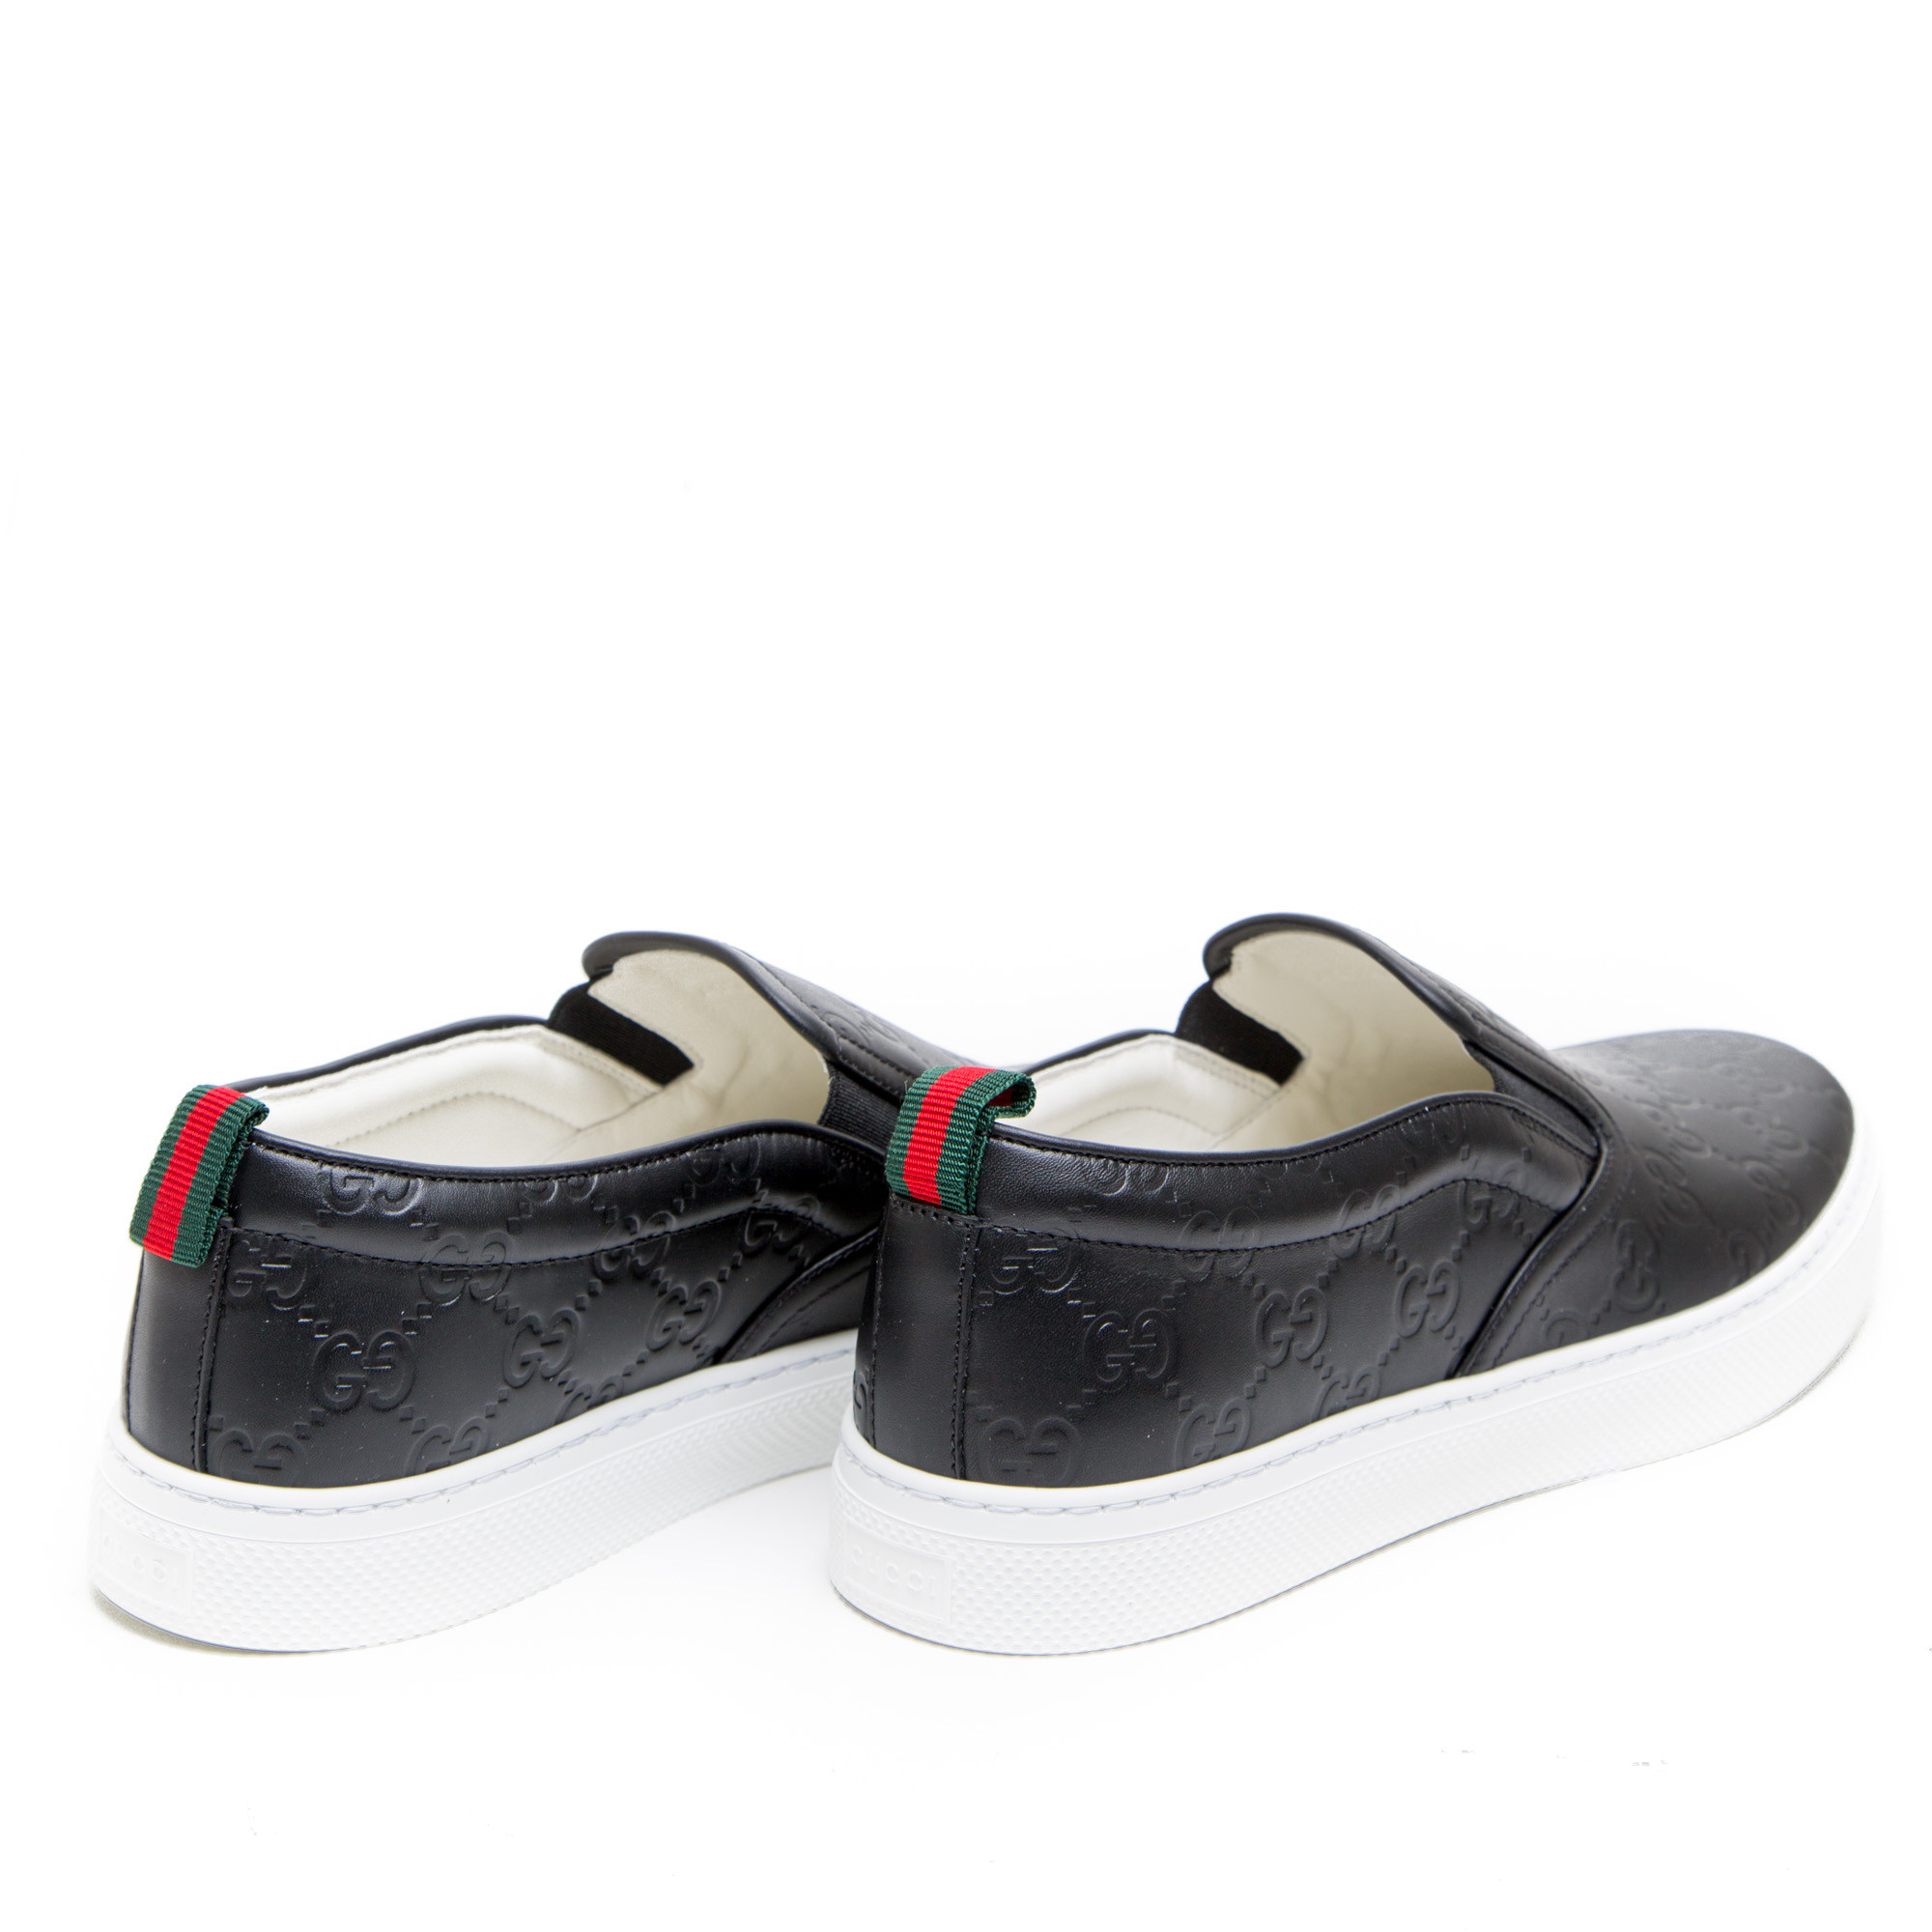 cf6db5fb0e7 ... Gucci sport shoes black Gucci sport shoes black - www.derodeloper.com -  Derodeloper ...